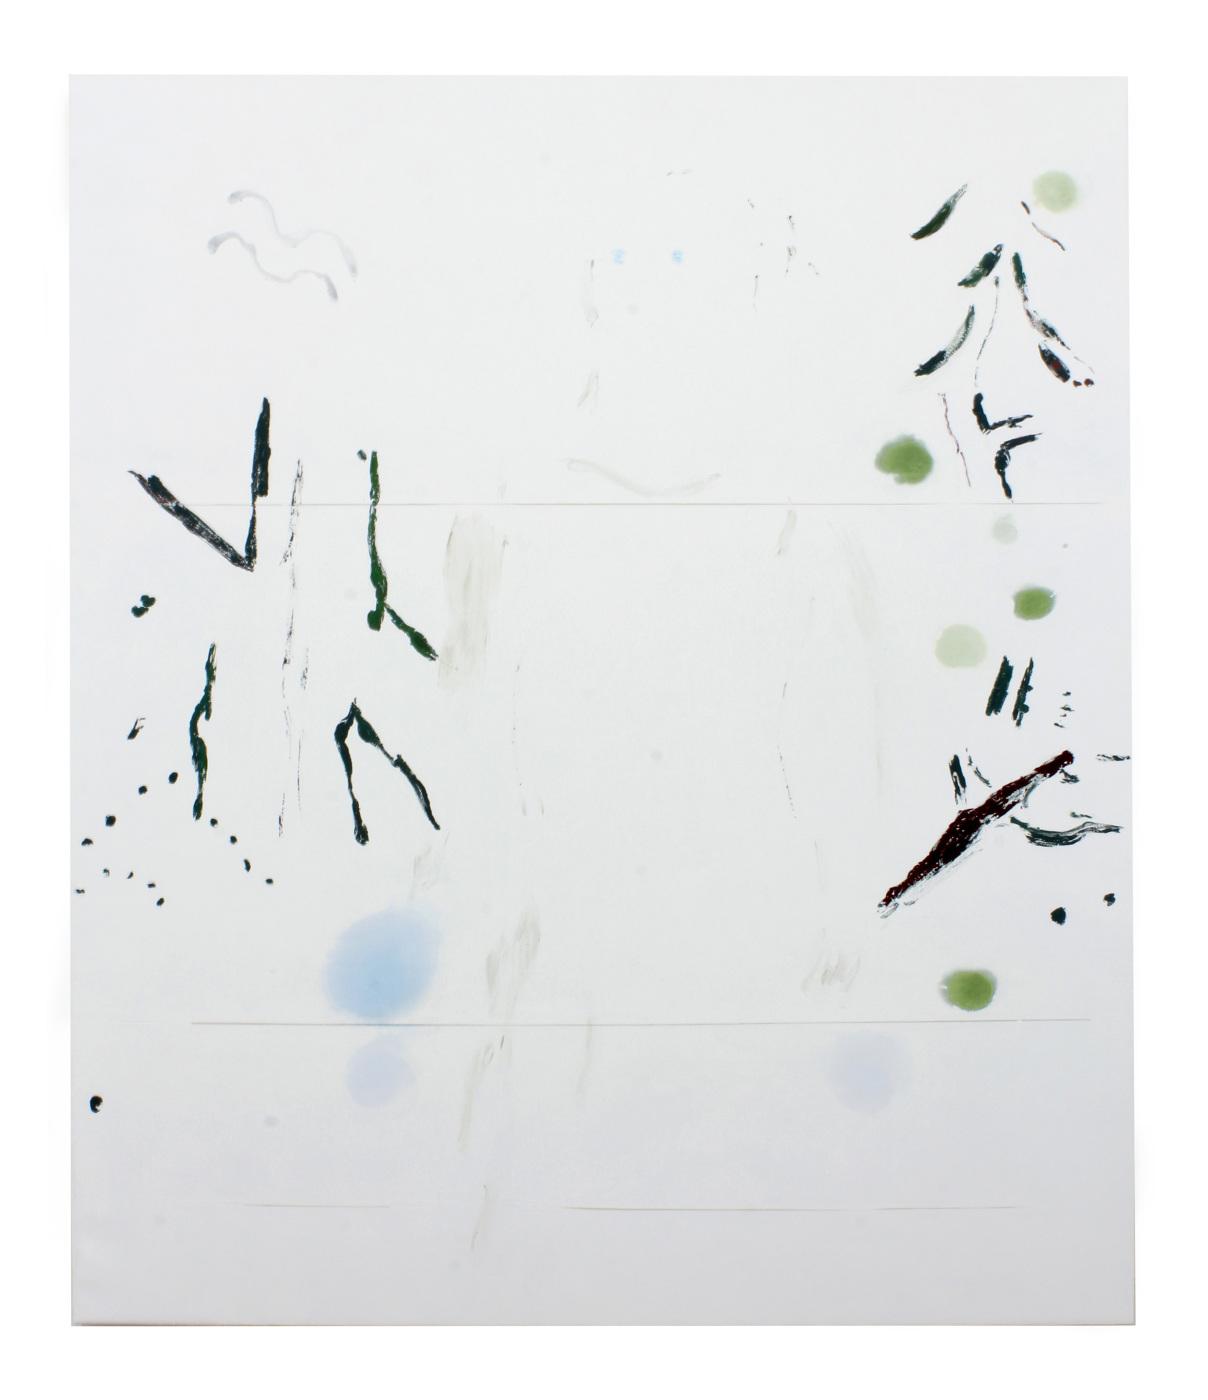 T293 - Henry Chapman - 8